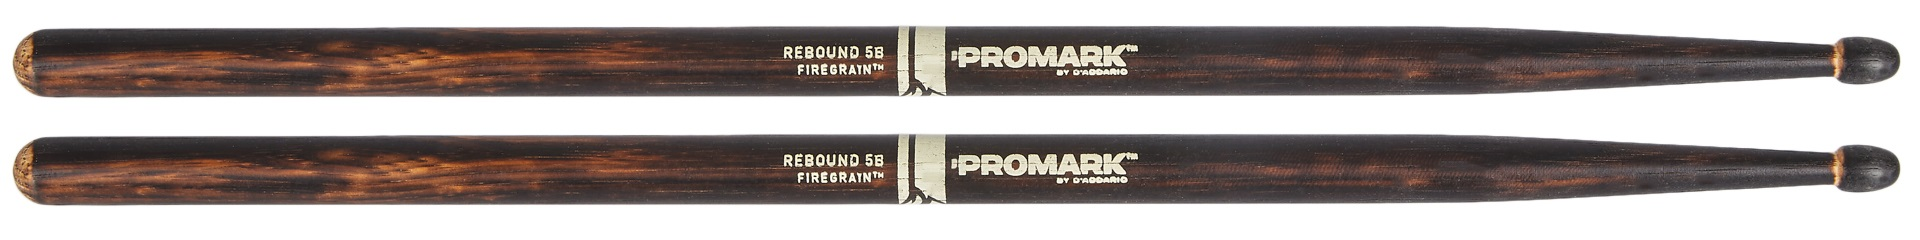 ProMark Rebound 5B FireGrain